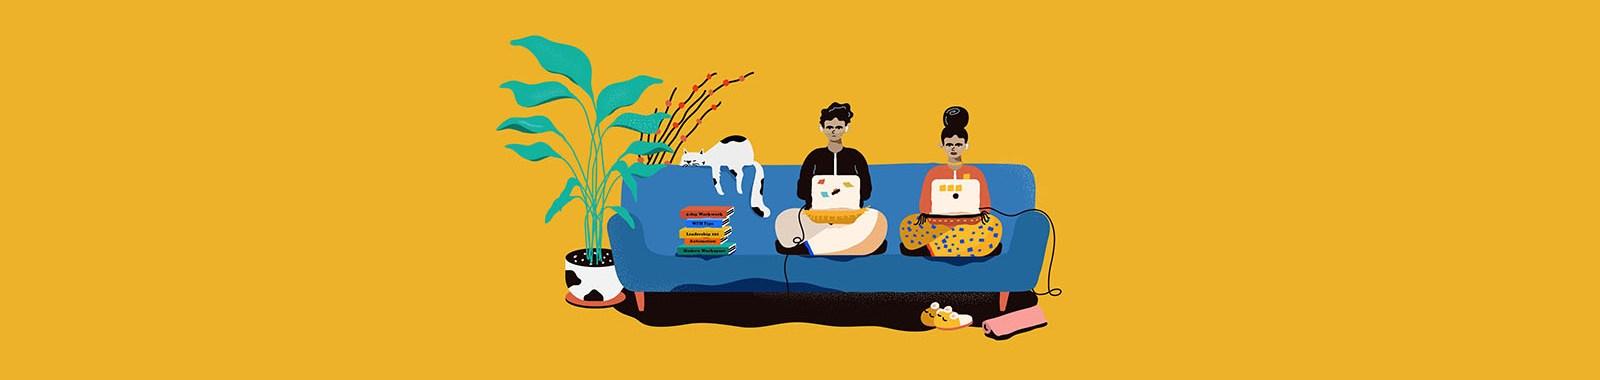 creators-at-home-eye